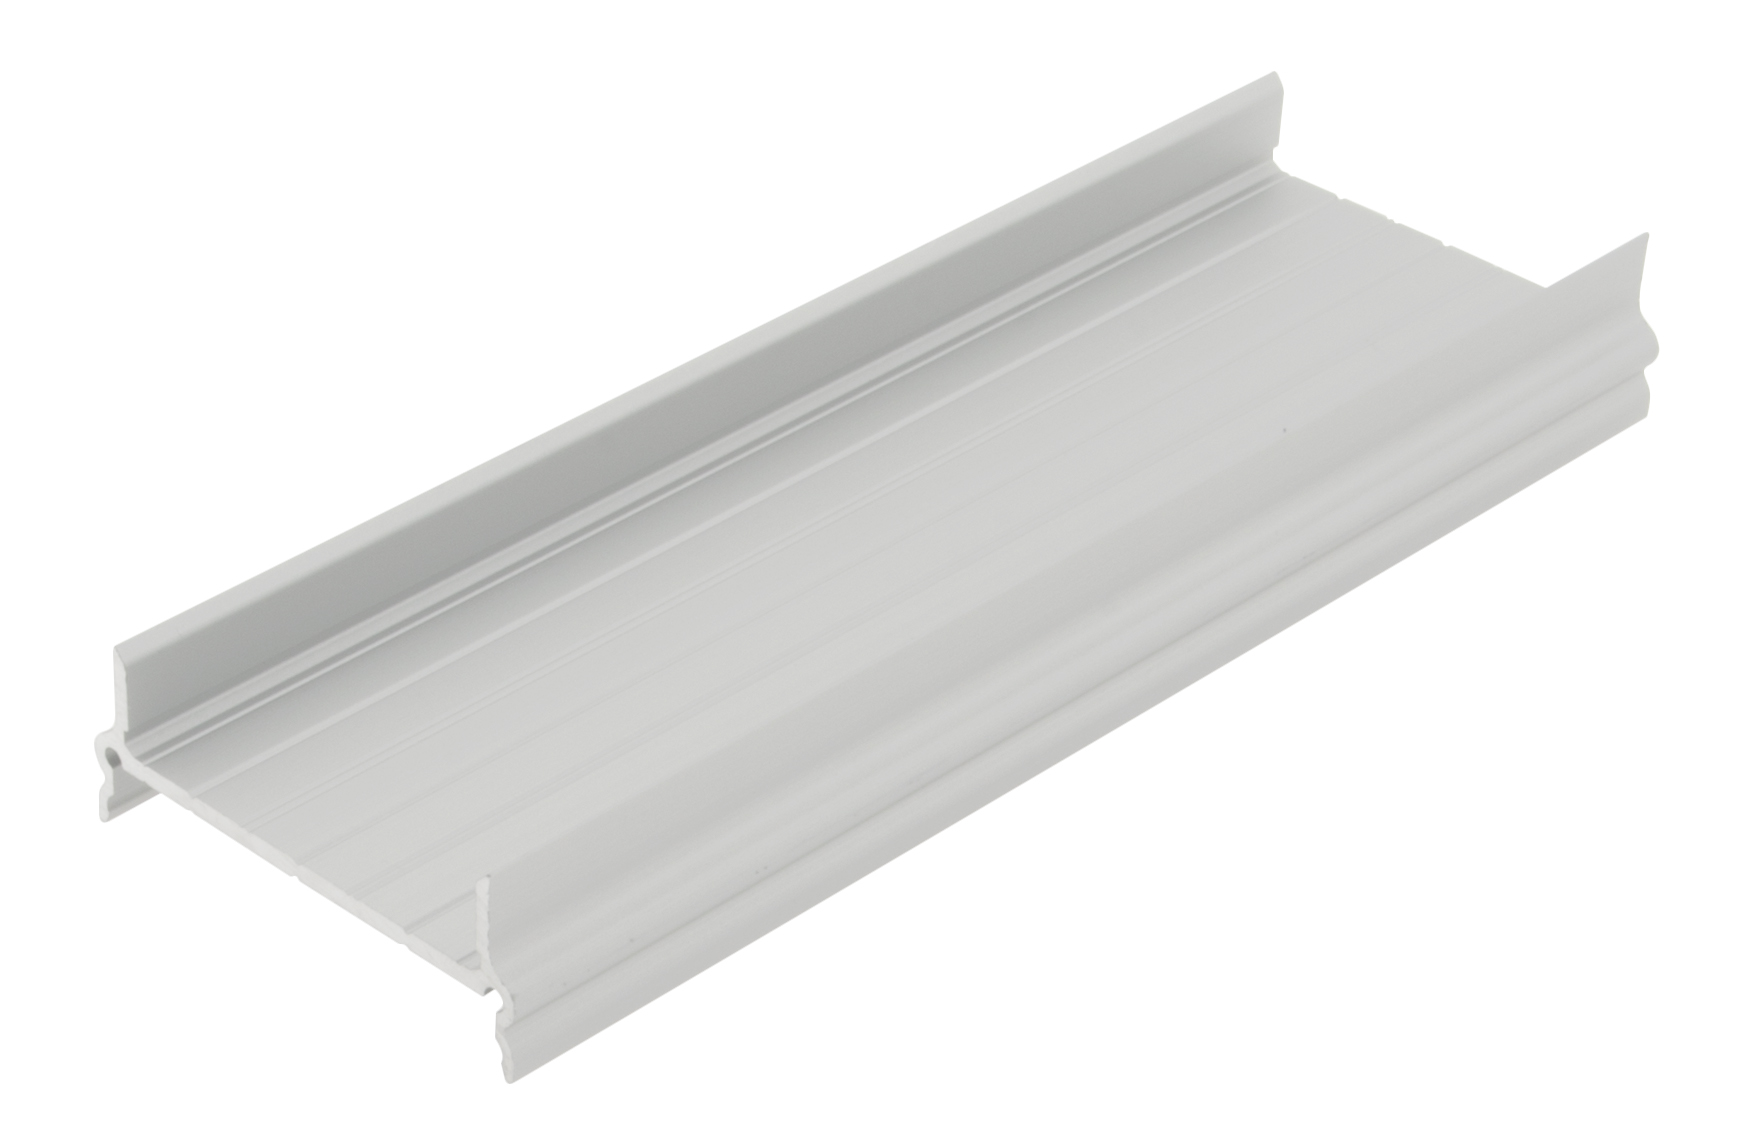 1 m Aluminium Einsatz SL LIAP003000